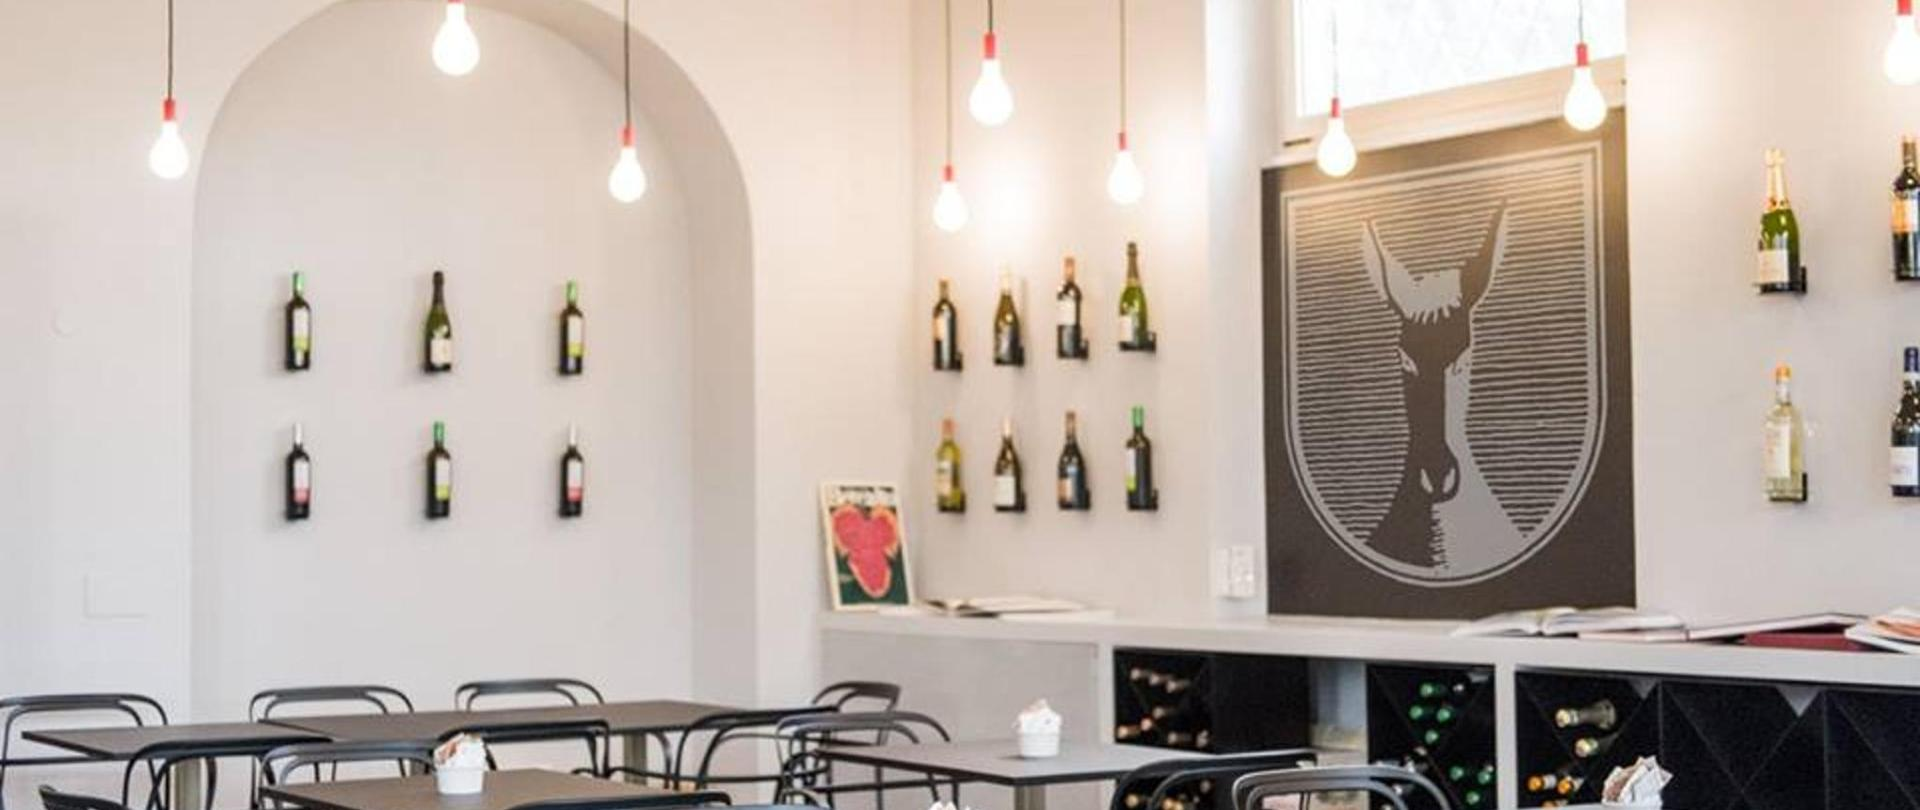 wine bar mus 2.jpg